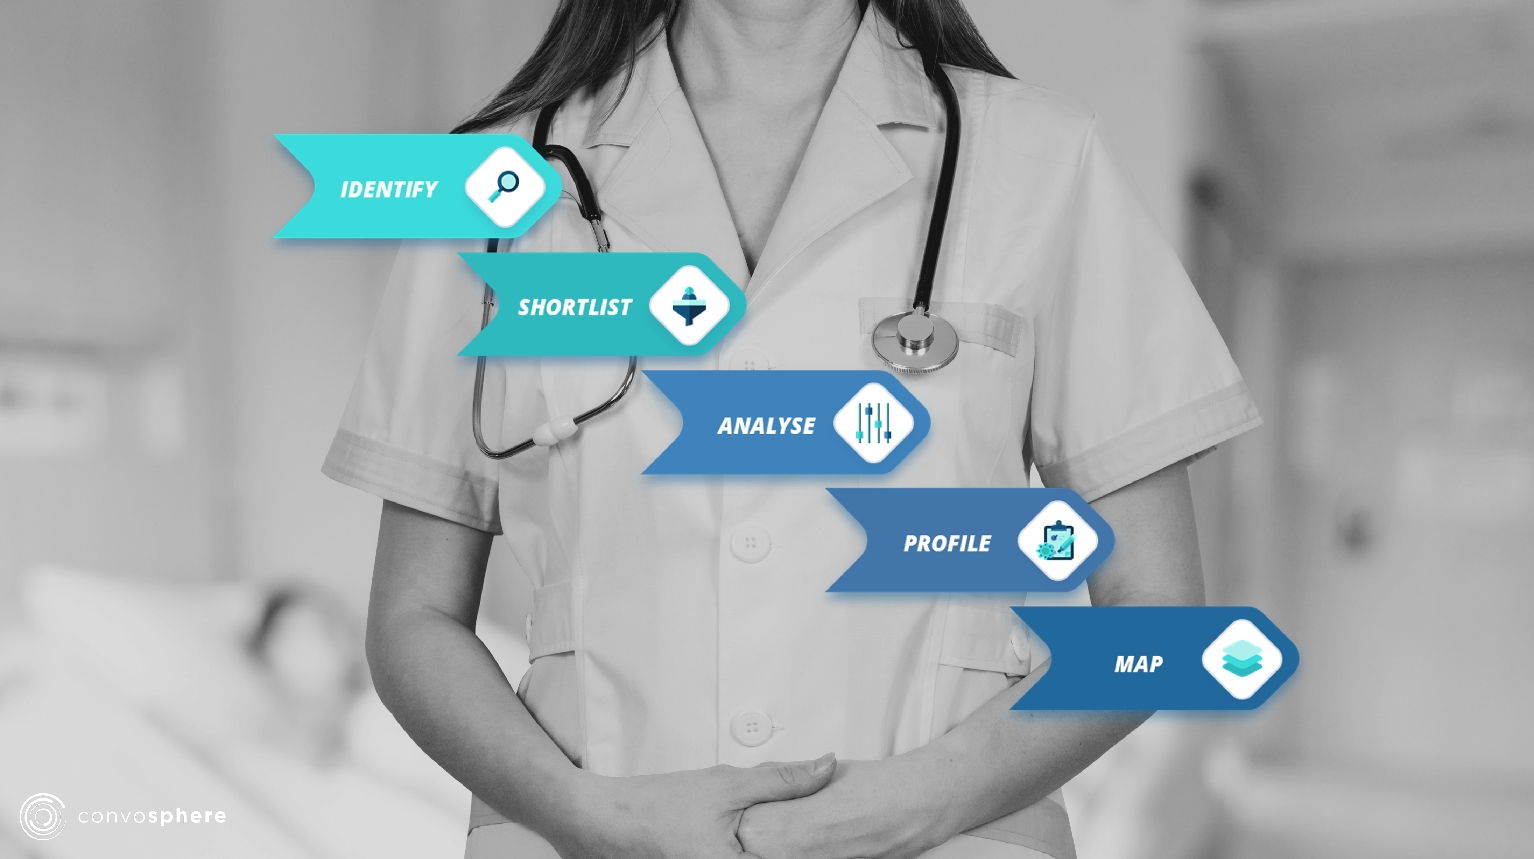 Five steps to optimise pharma-KOI collaboration